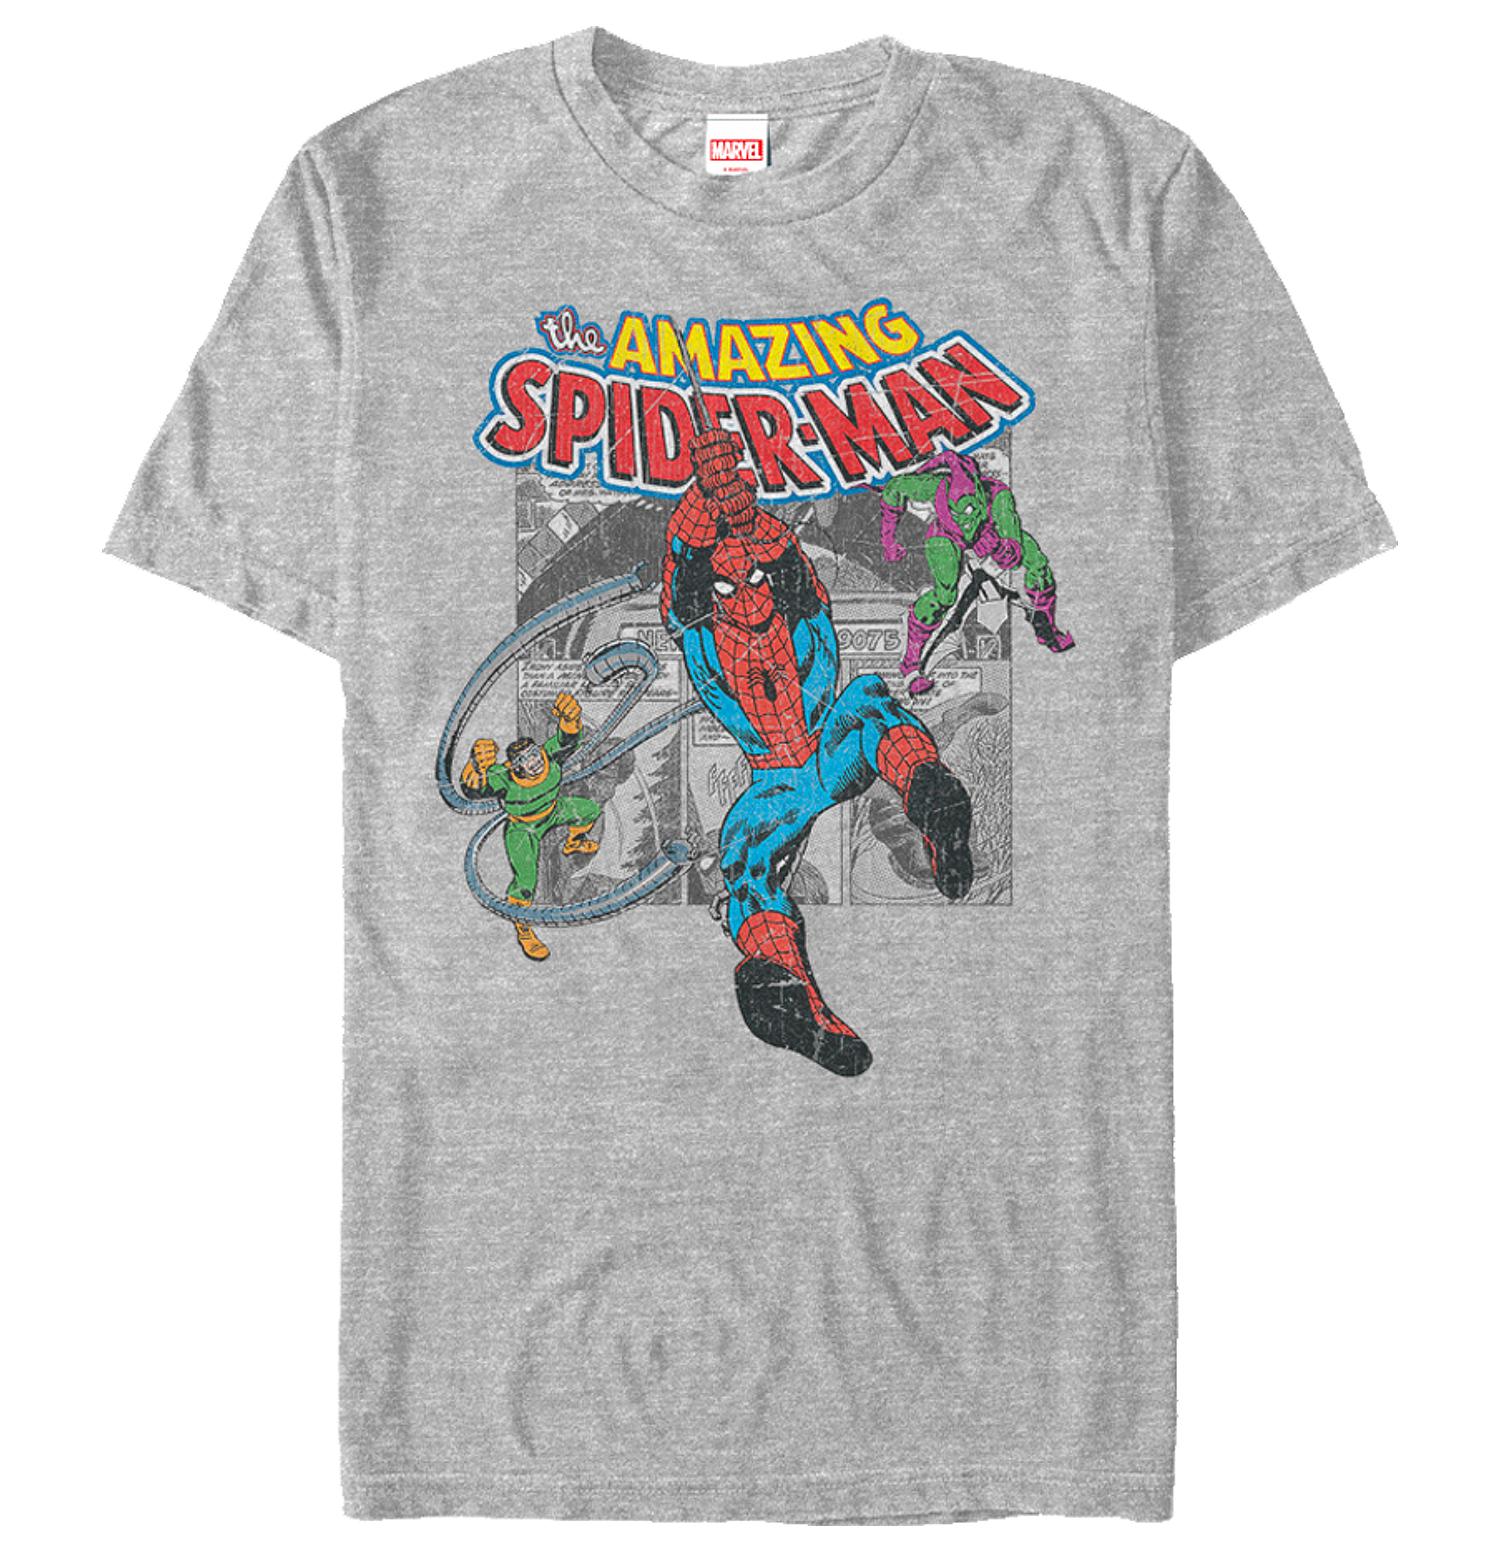 air-jordan-1-origin-story-spiderman-sneaker-tee-shirt-11